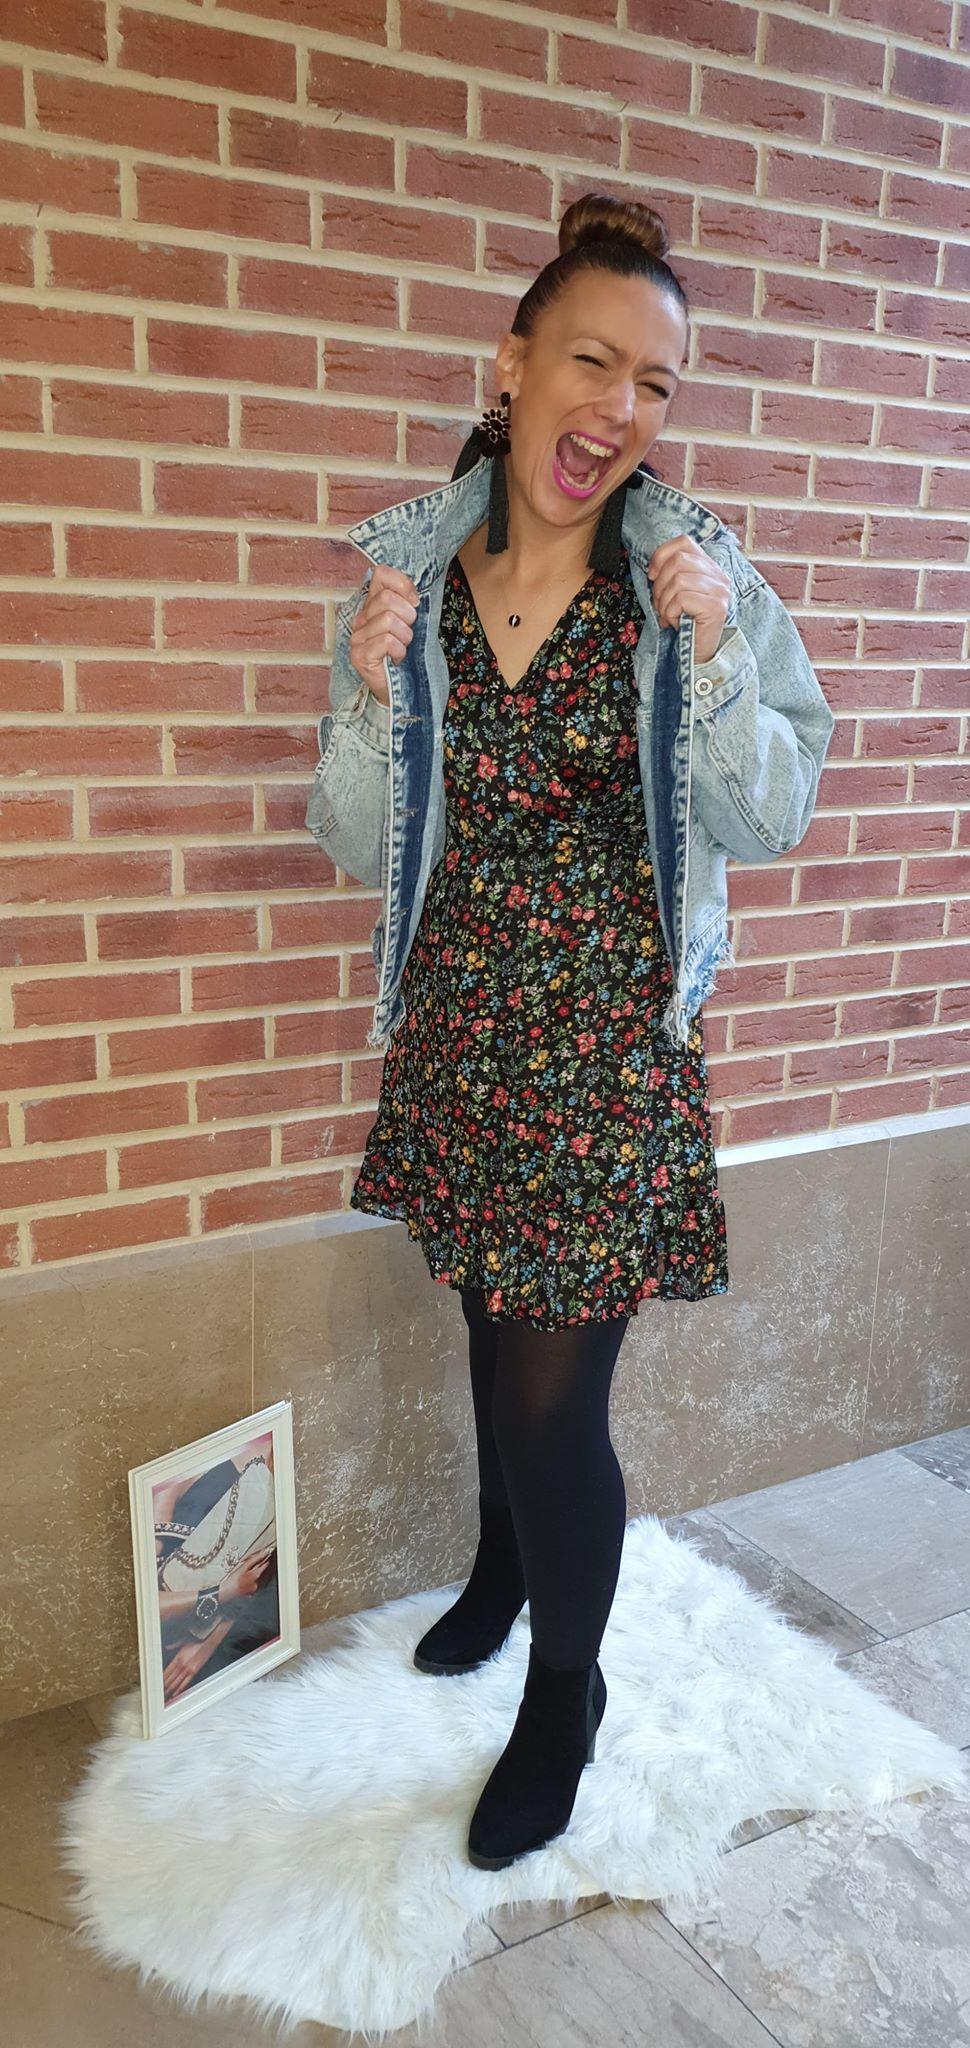 robe manche courte fleurie - rob-man-cou-fle